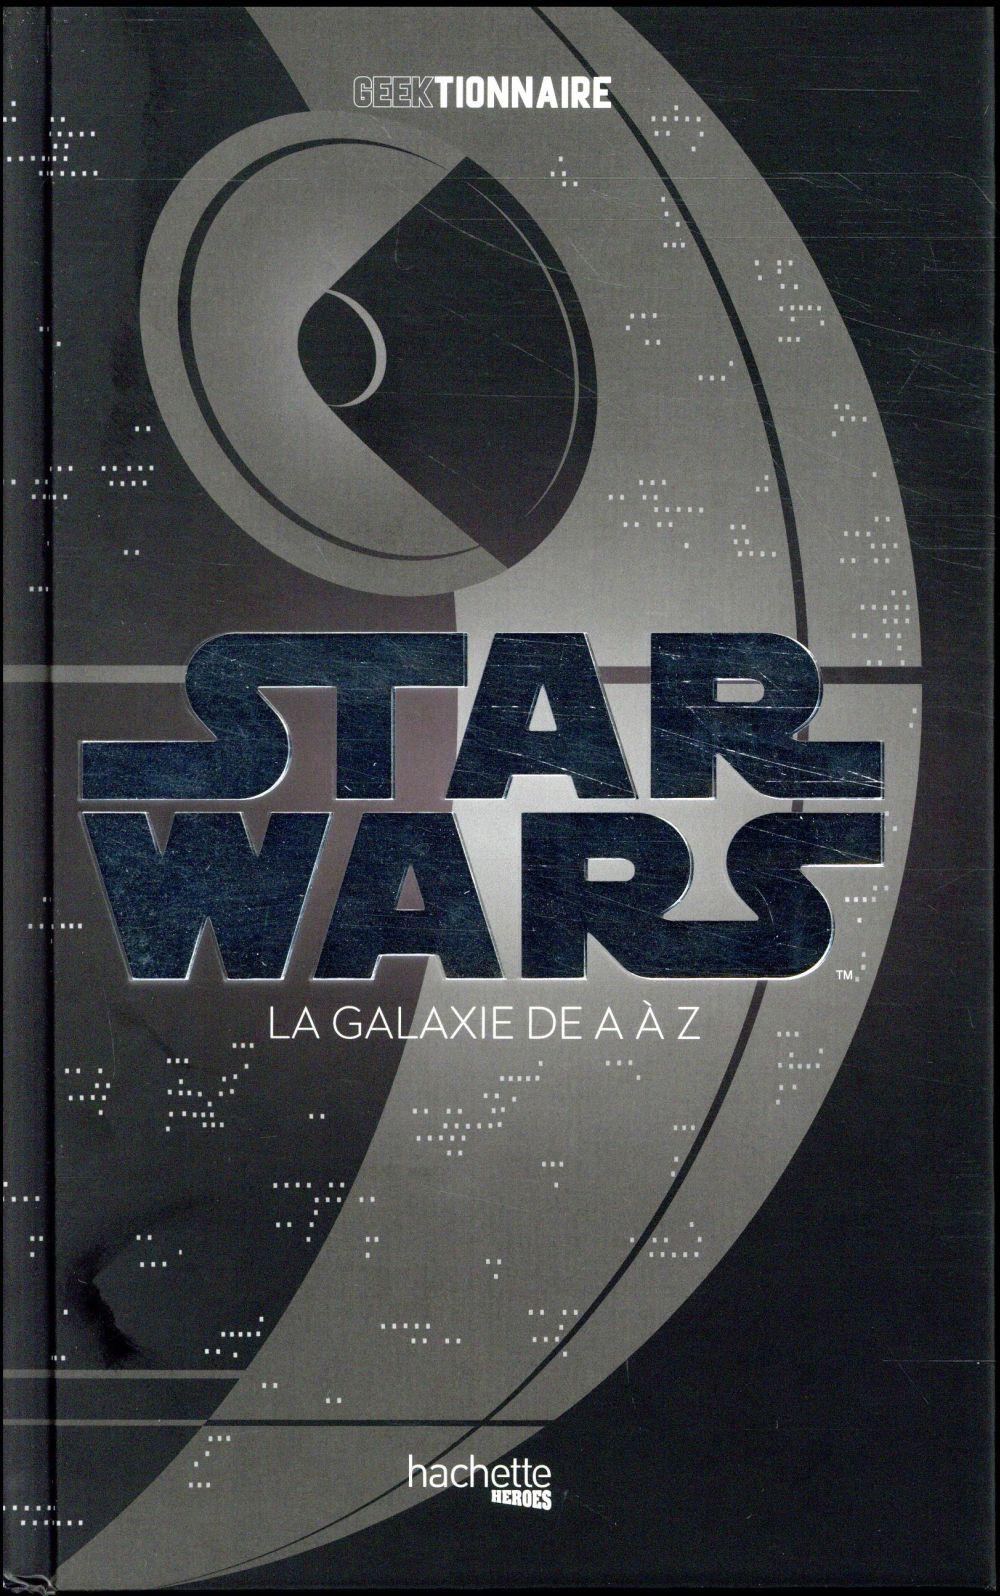 Geektionnaire de Star Wars